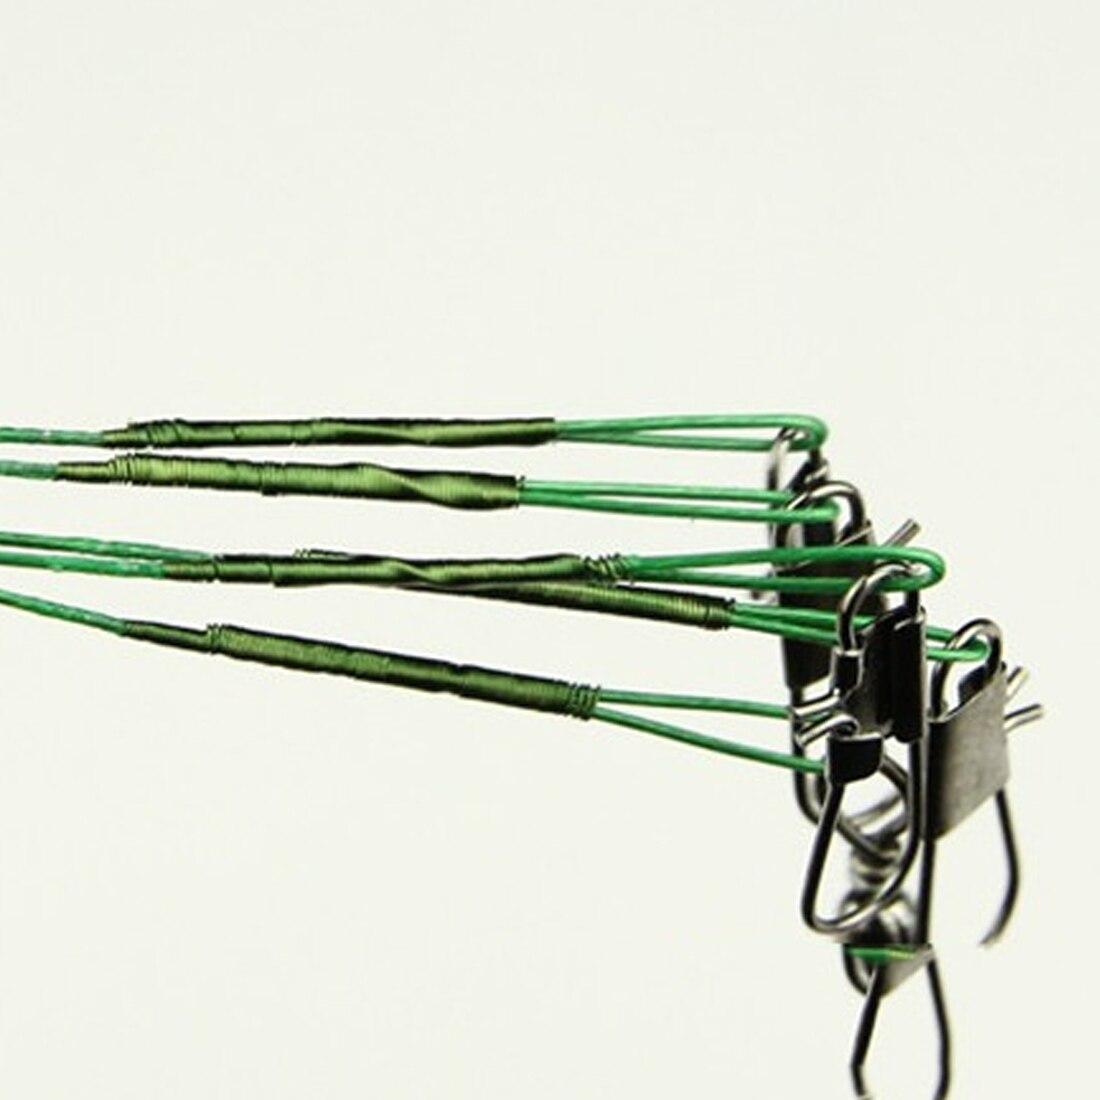 20Pcs Anti-bite Fly Leash Fishing Lead Line Rope Wire Leading Line Swivel Ke